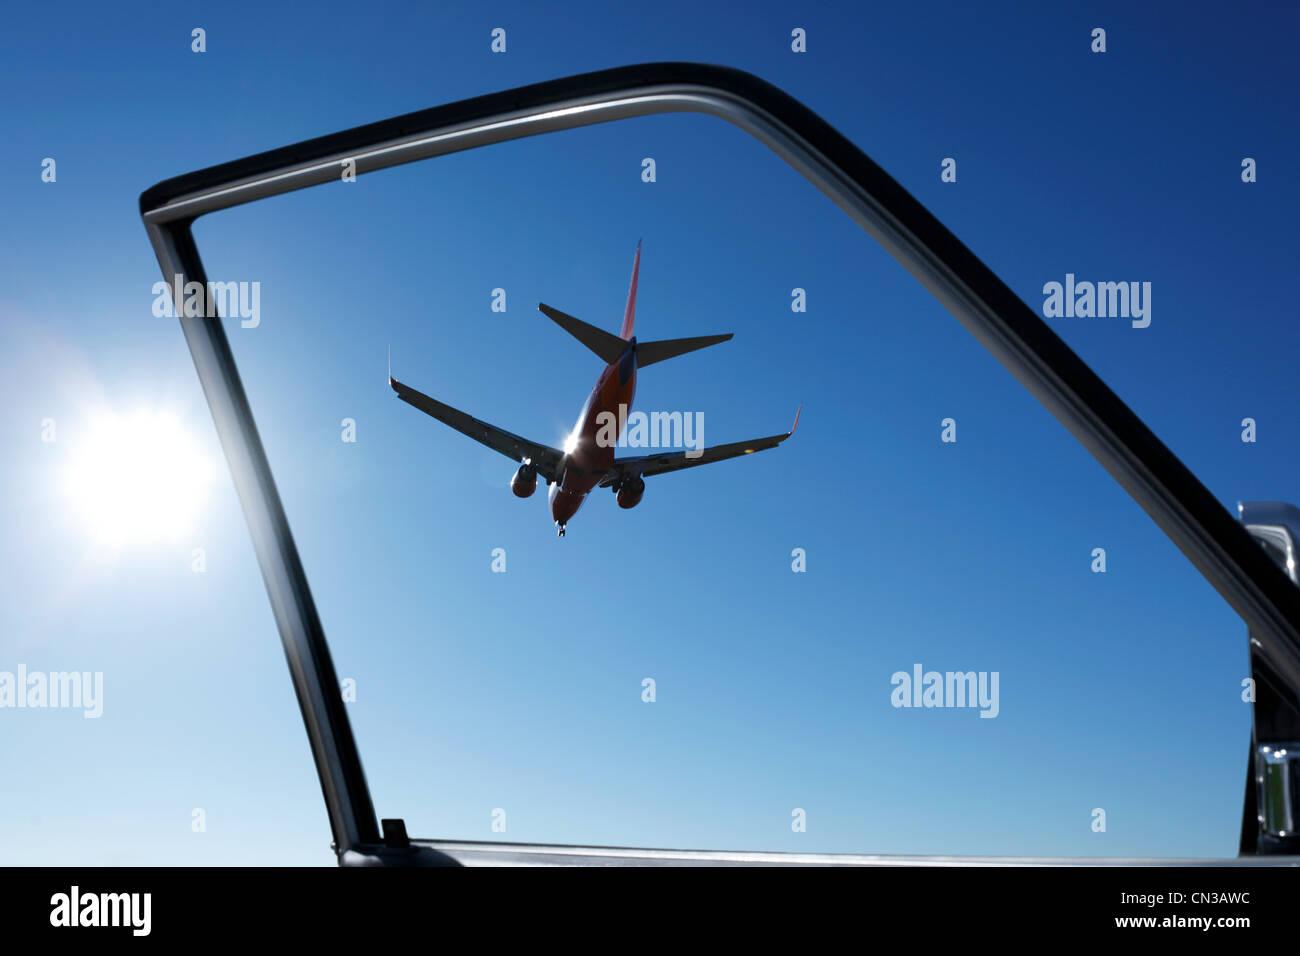 Autotür mit Blick auf Flugzeug Stockbild